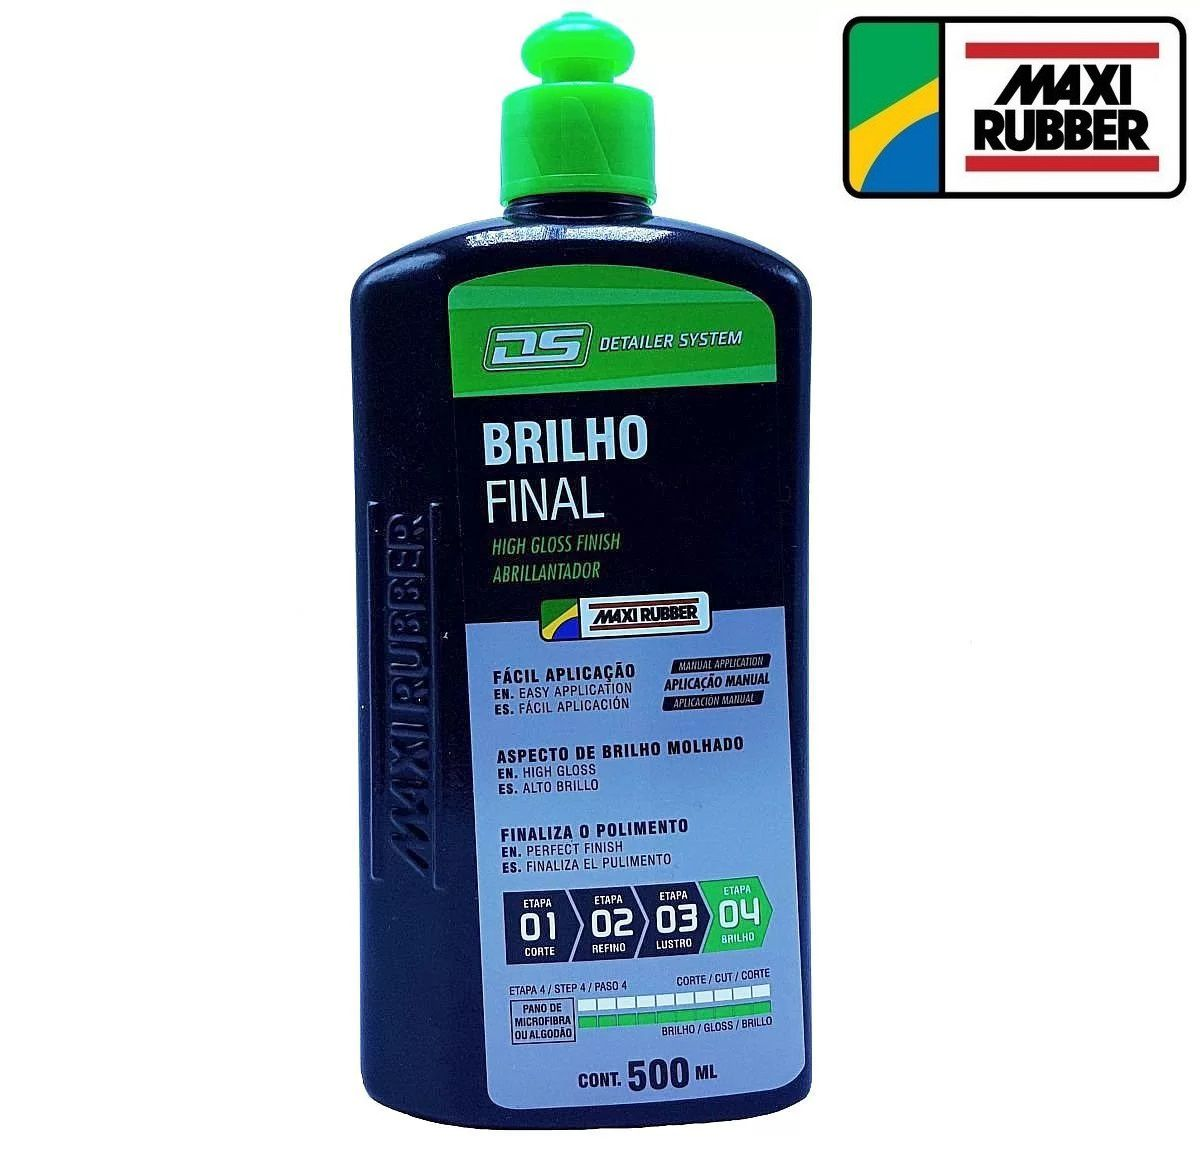 Liquido Finalizador Brilho Final Detailer 500ml Maxi Rubber